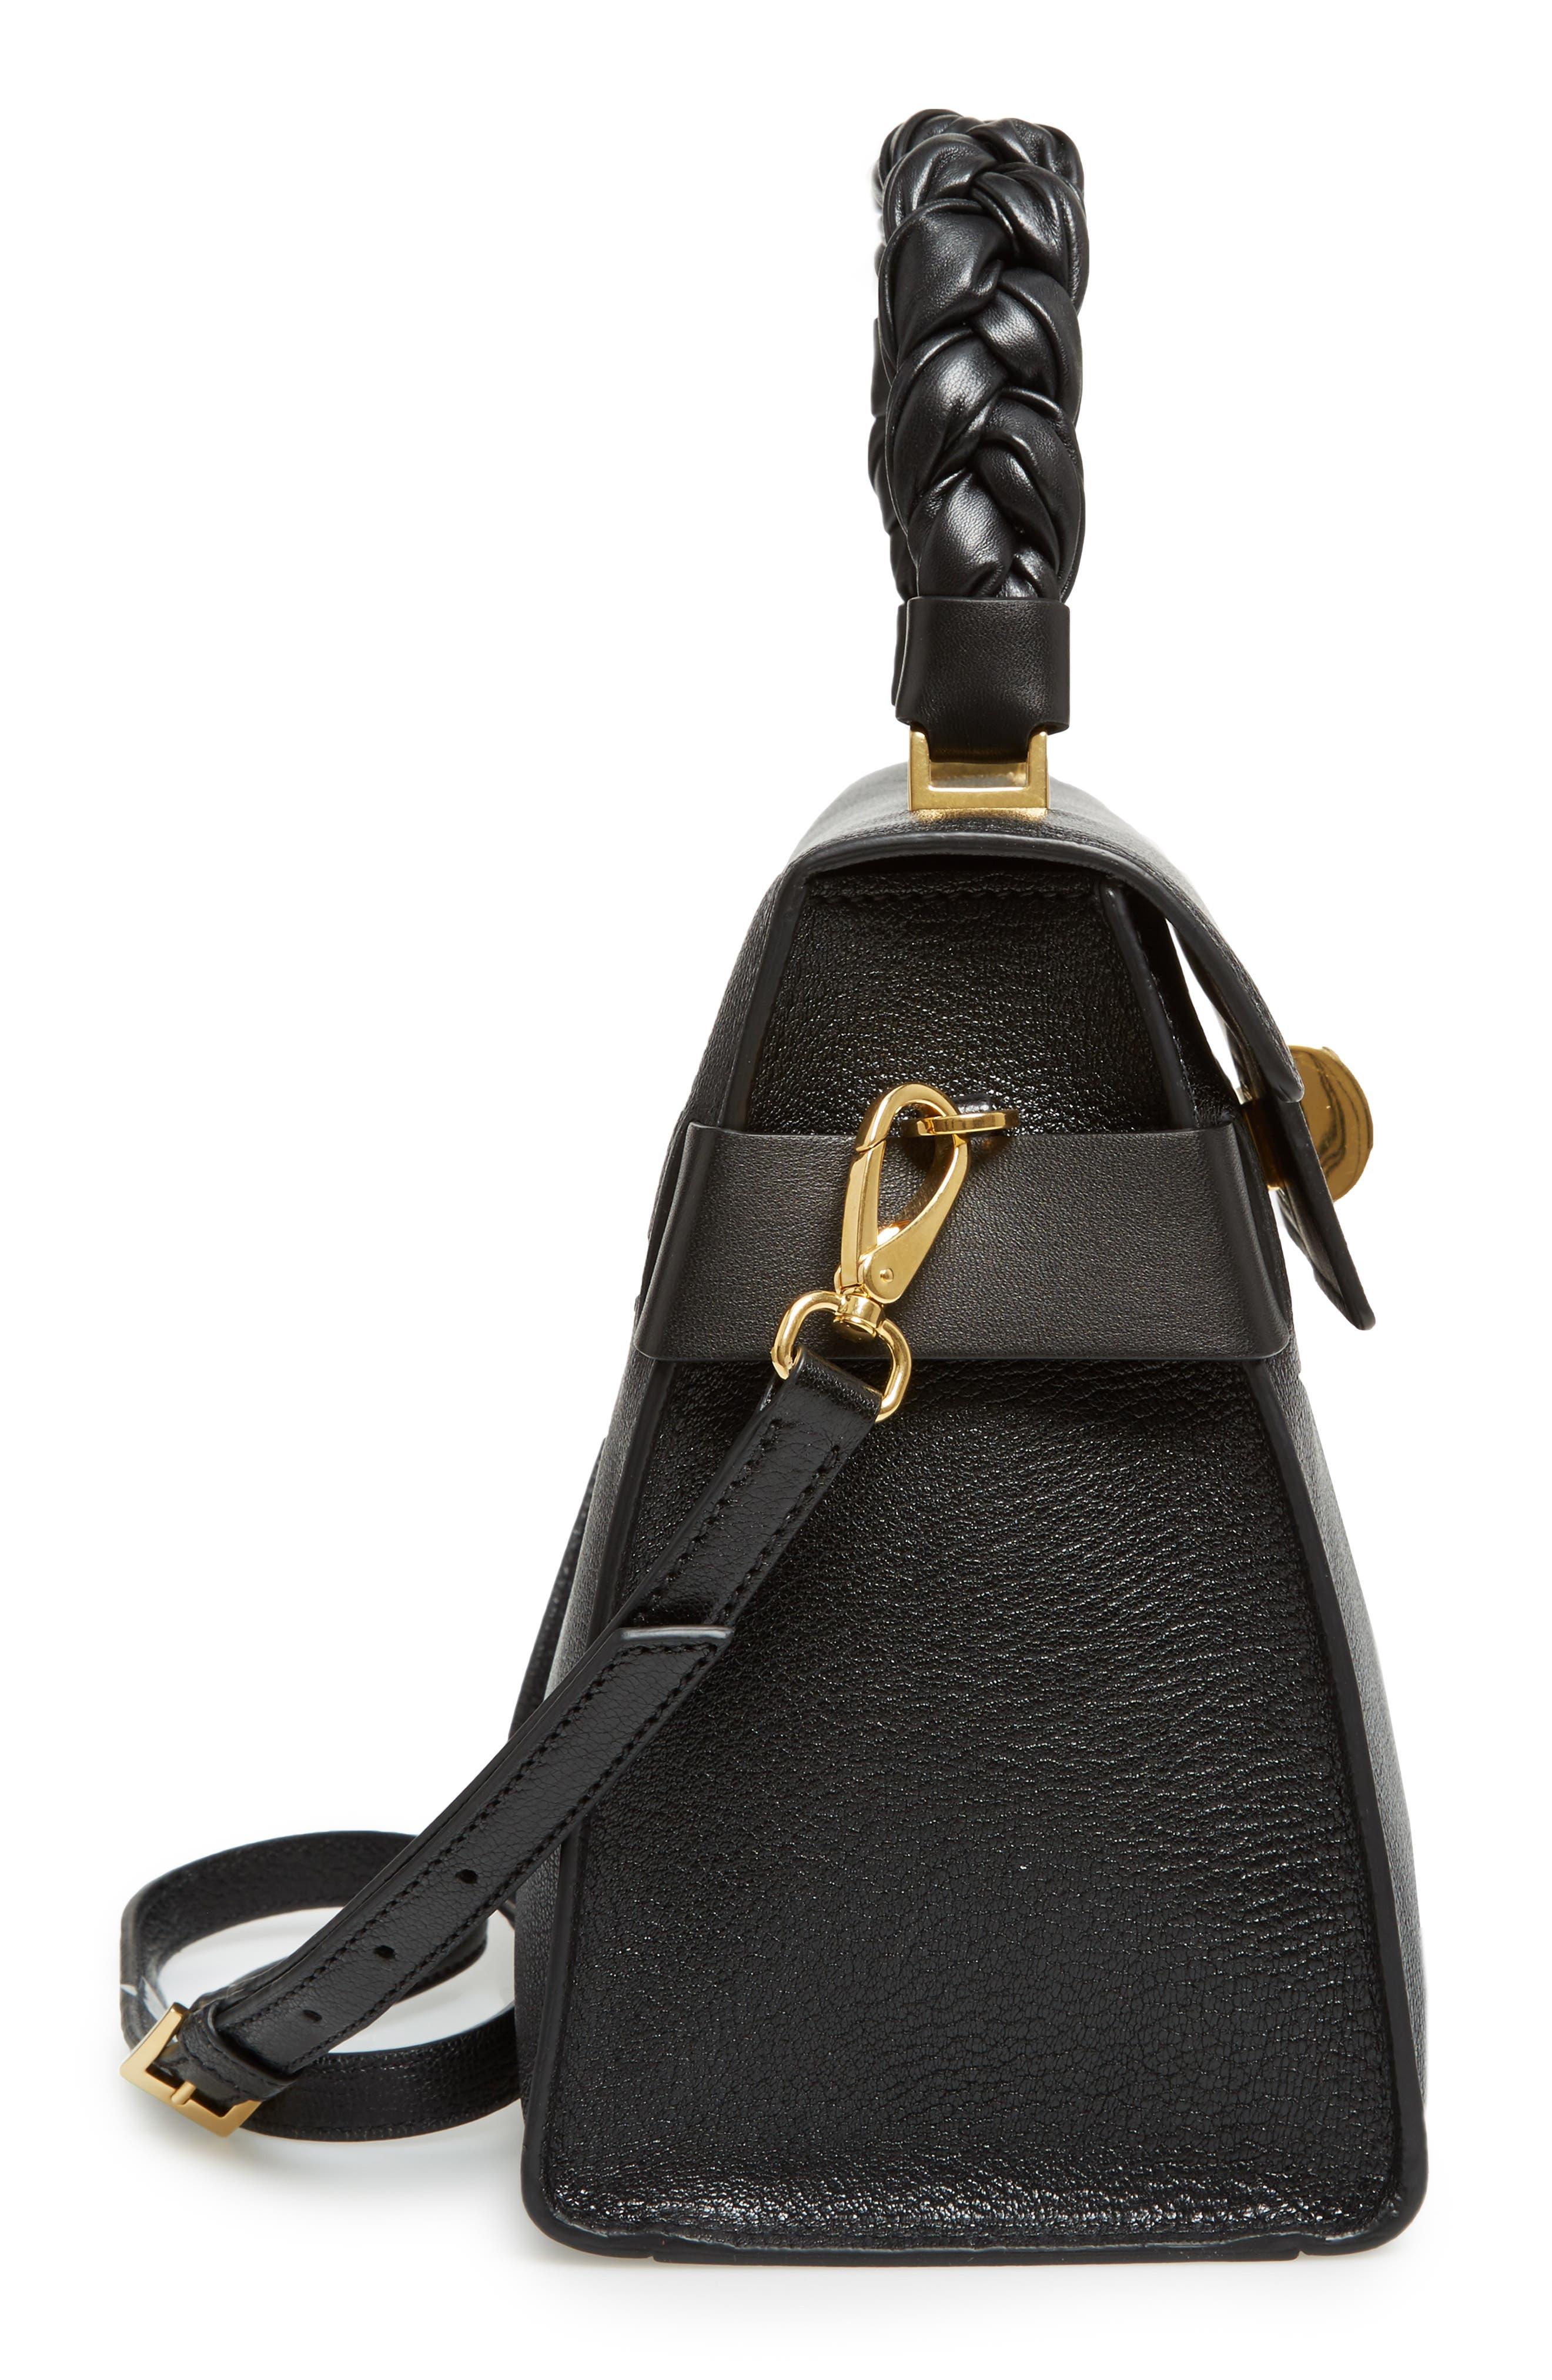 Madras Click Goatskin Leather Satchel,                             Alternate thumbnail 5, color,                             Black